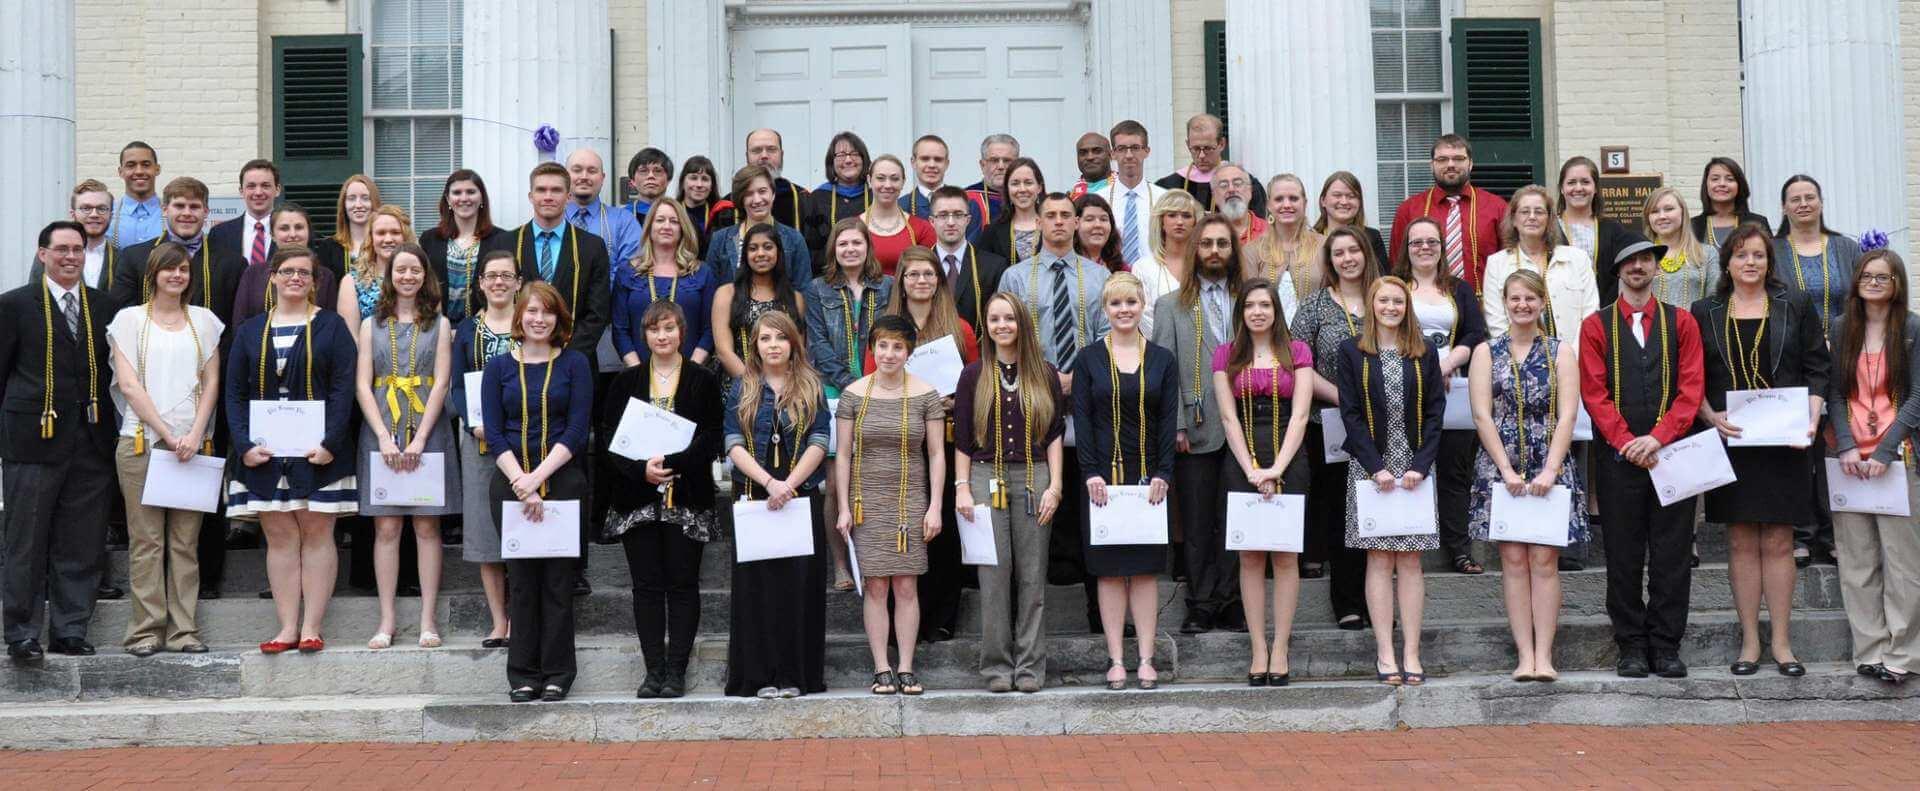 Shepherd University | Student Honors